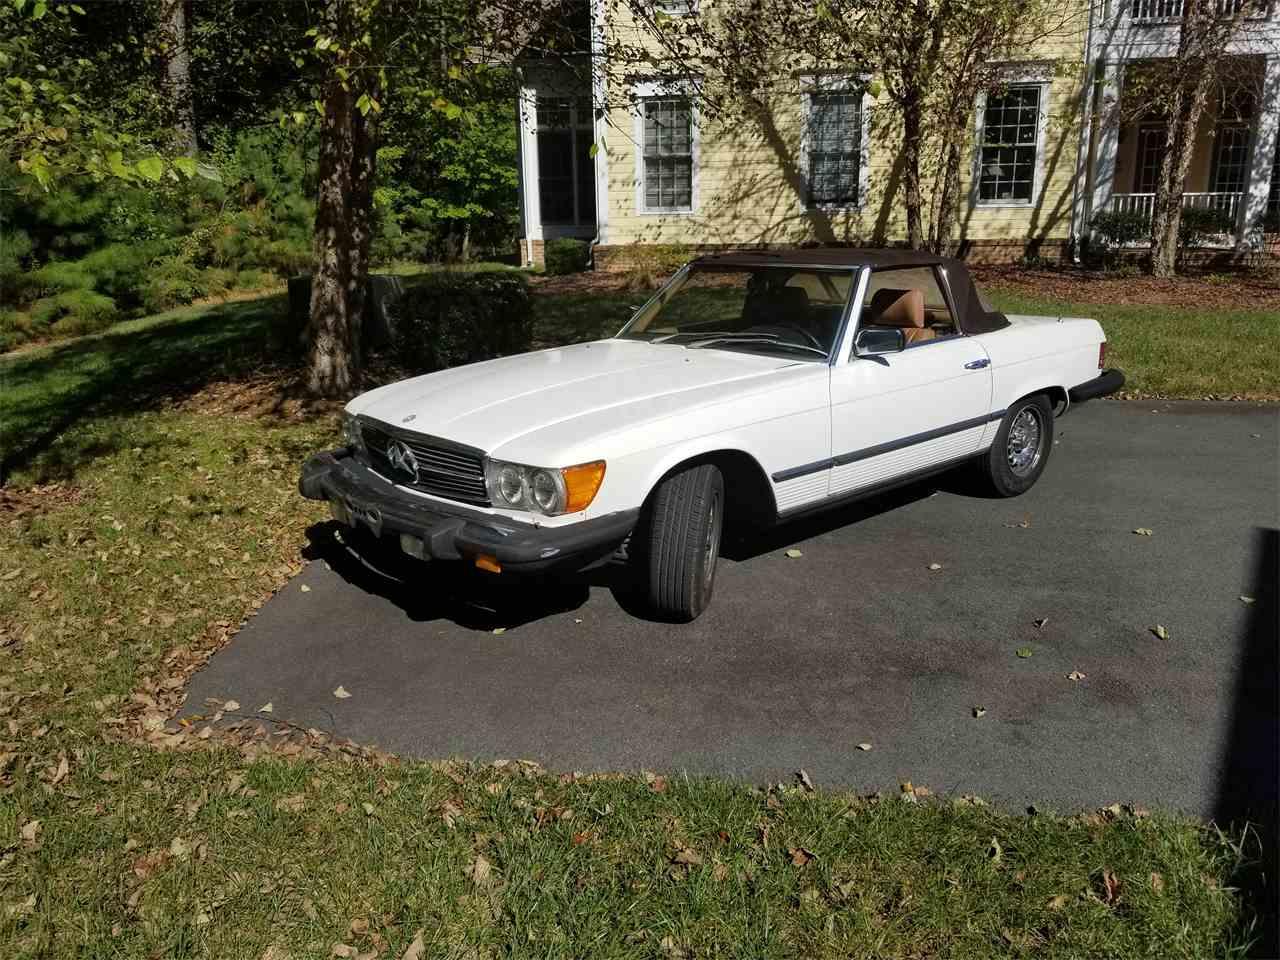 1982 Mercedes-Benz 380SL for Sale | ClassicCars.com | CC-1086964